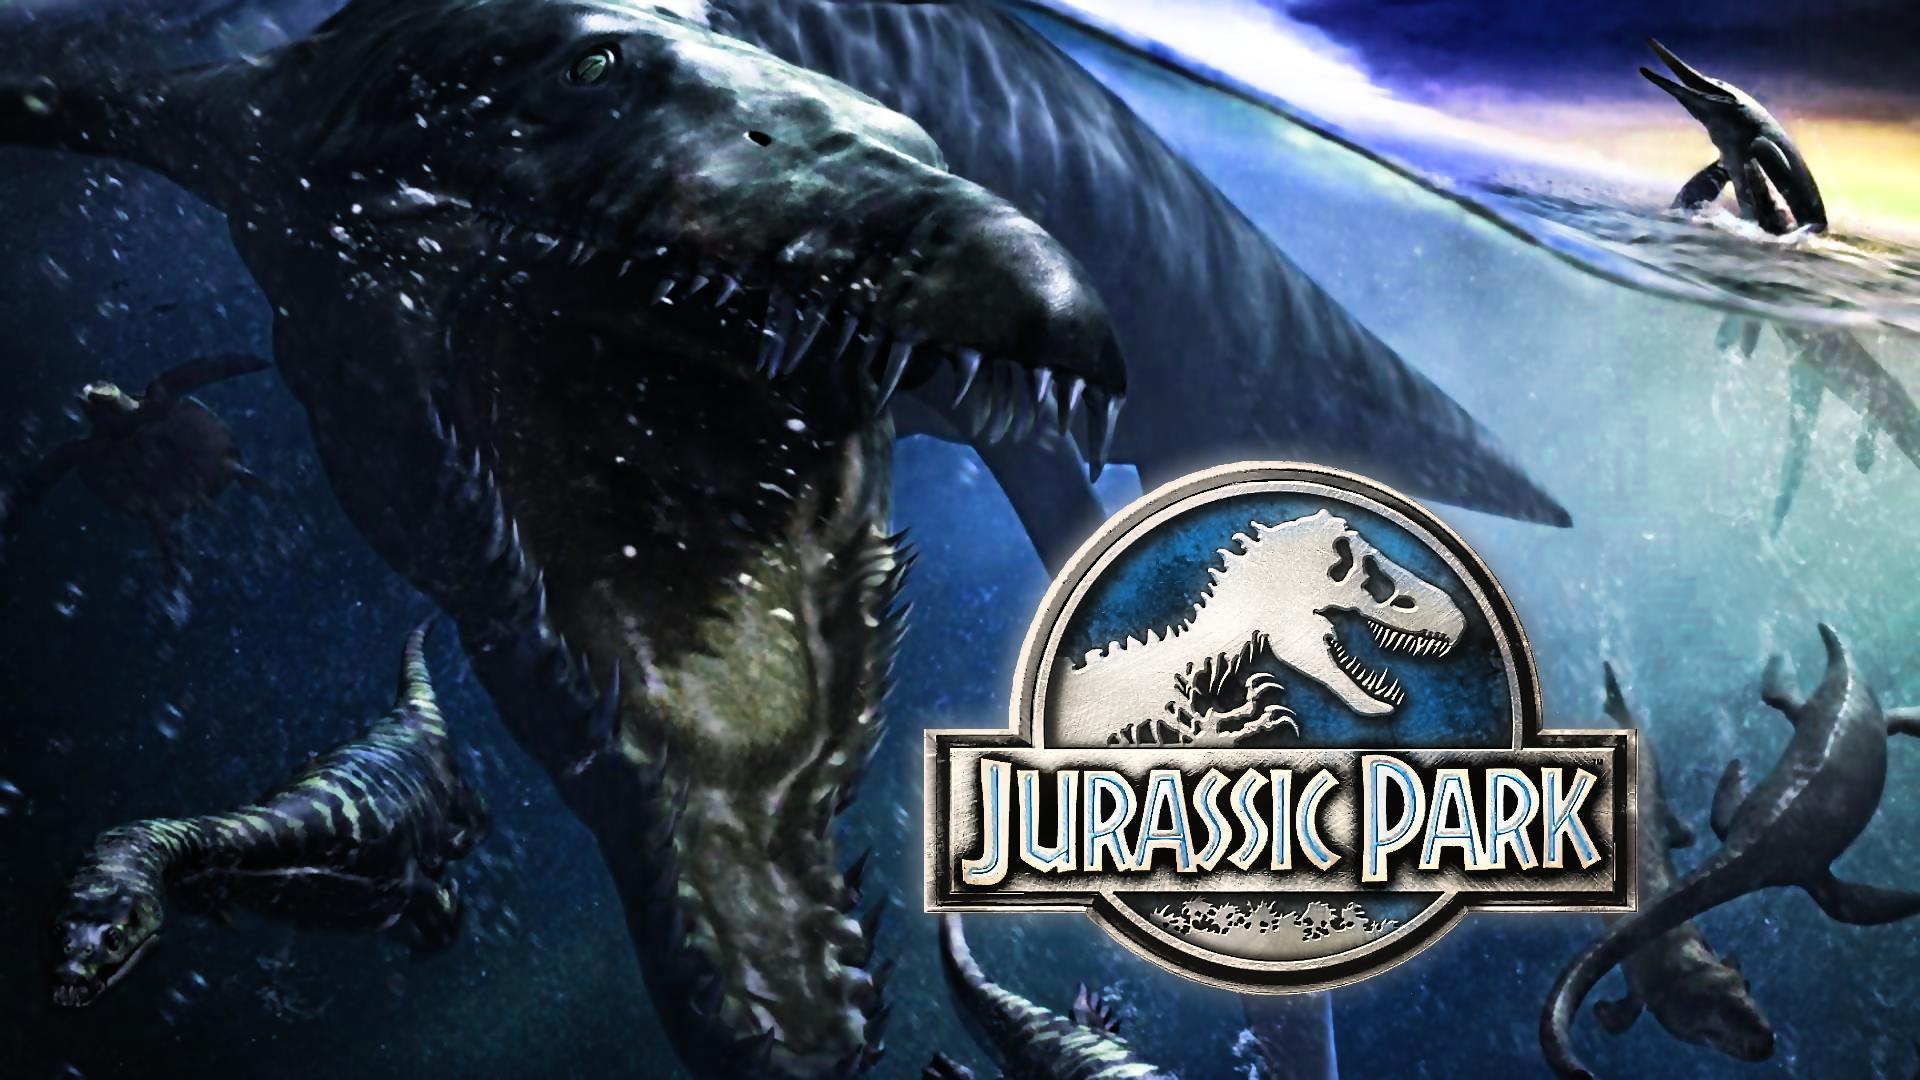 Jurassic Park 3 Wallpapers